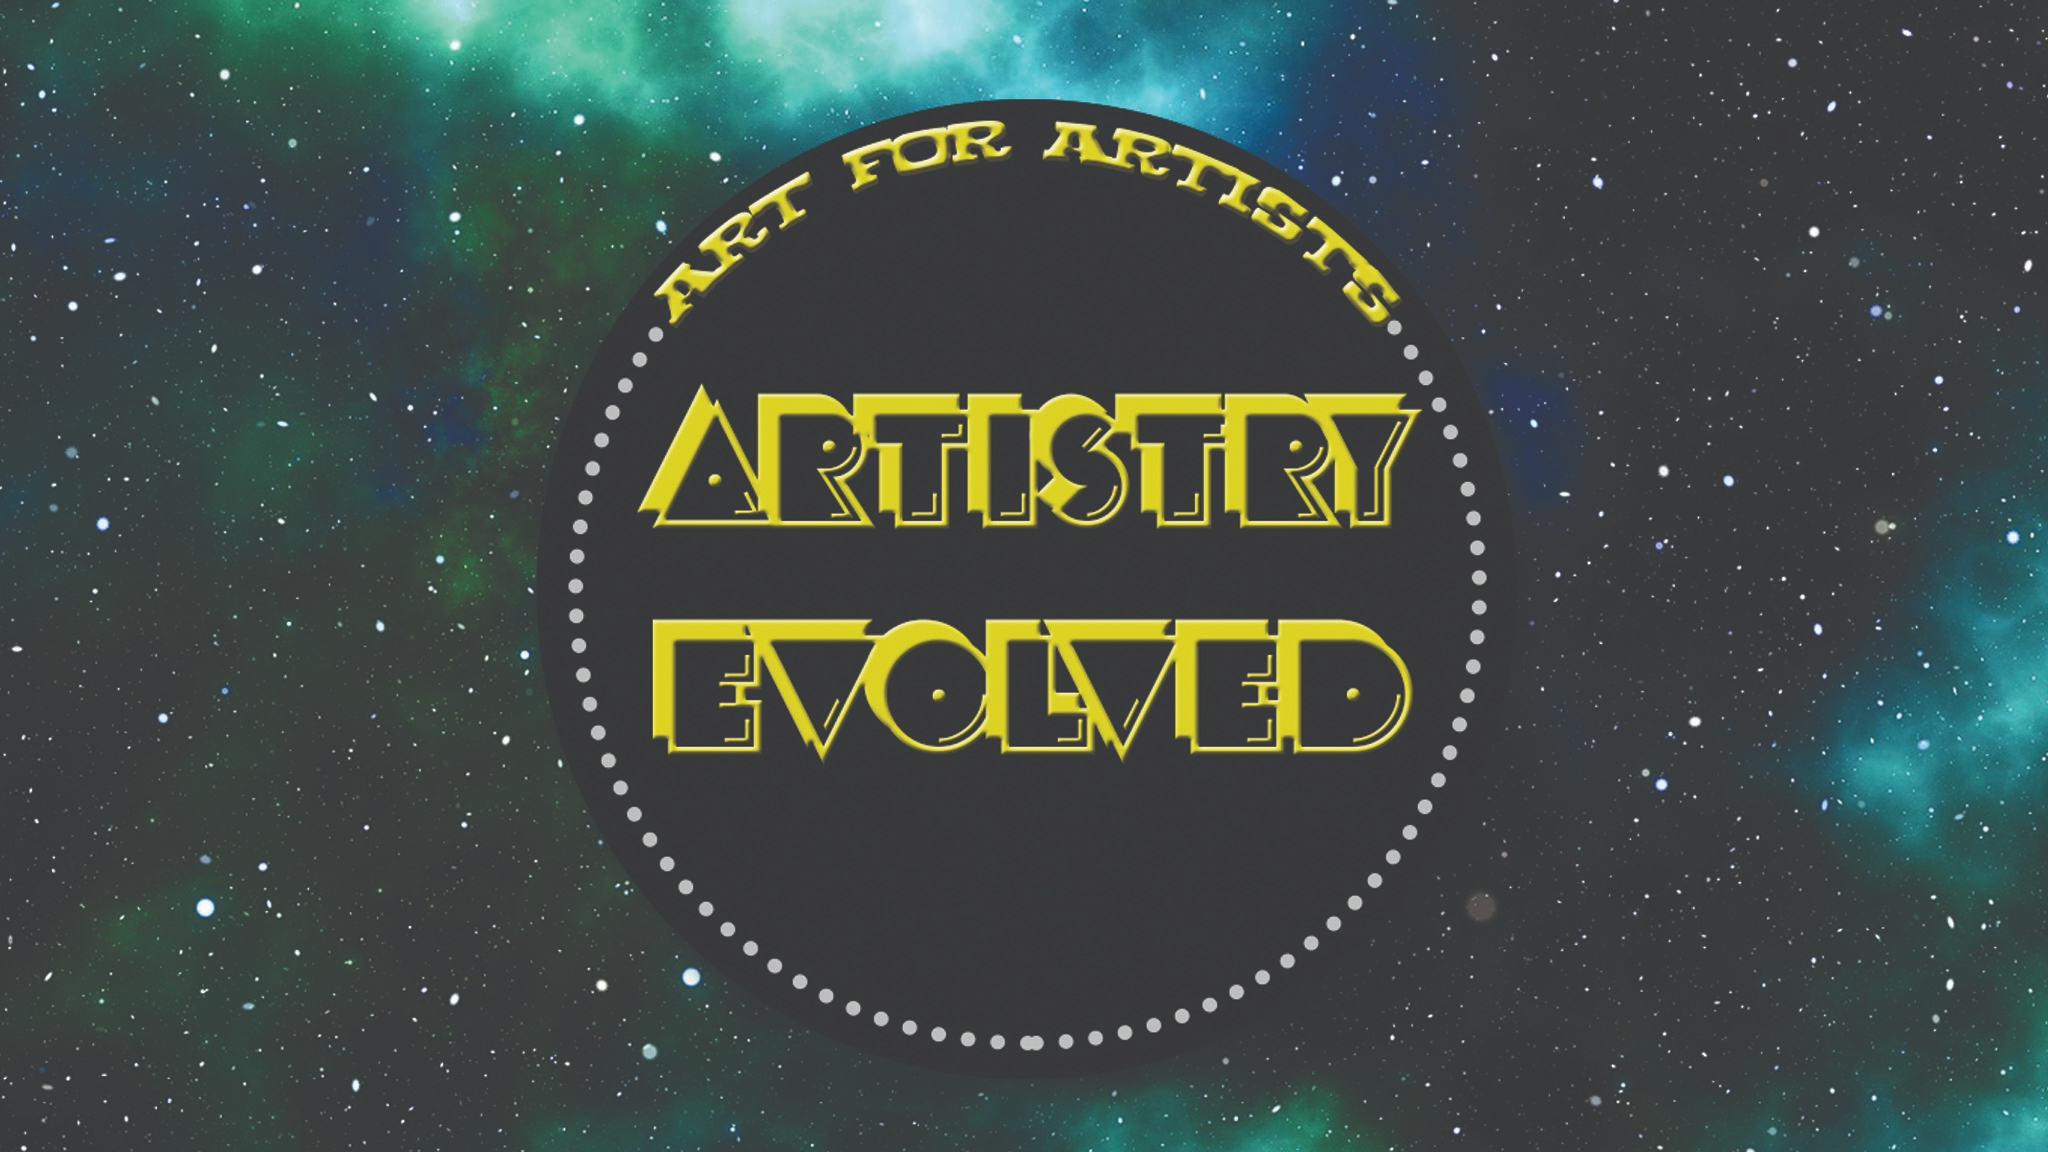 Michael Durham (@artistryevolved) Cover Image